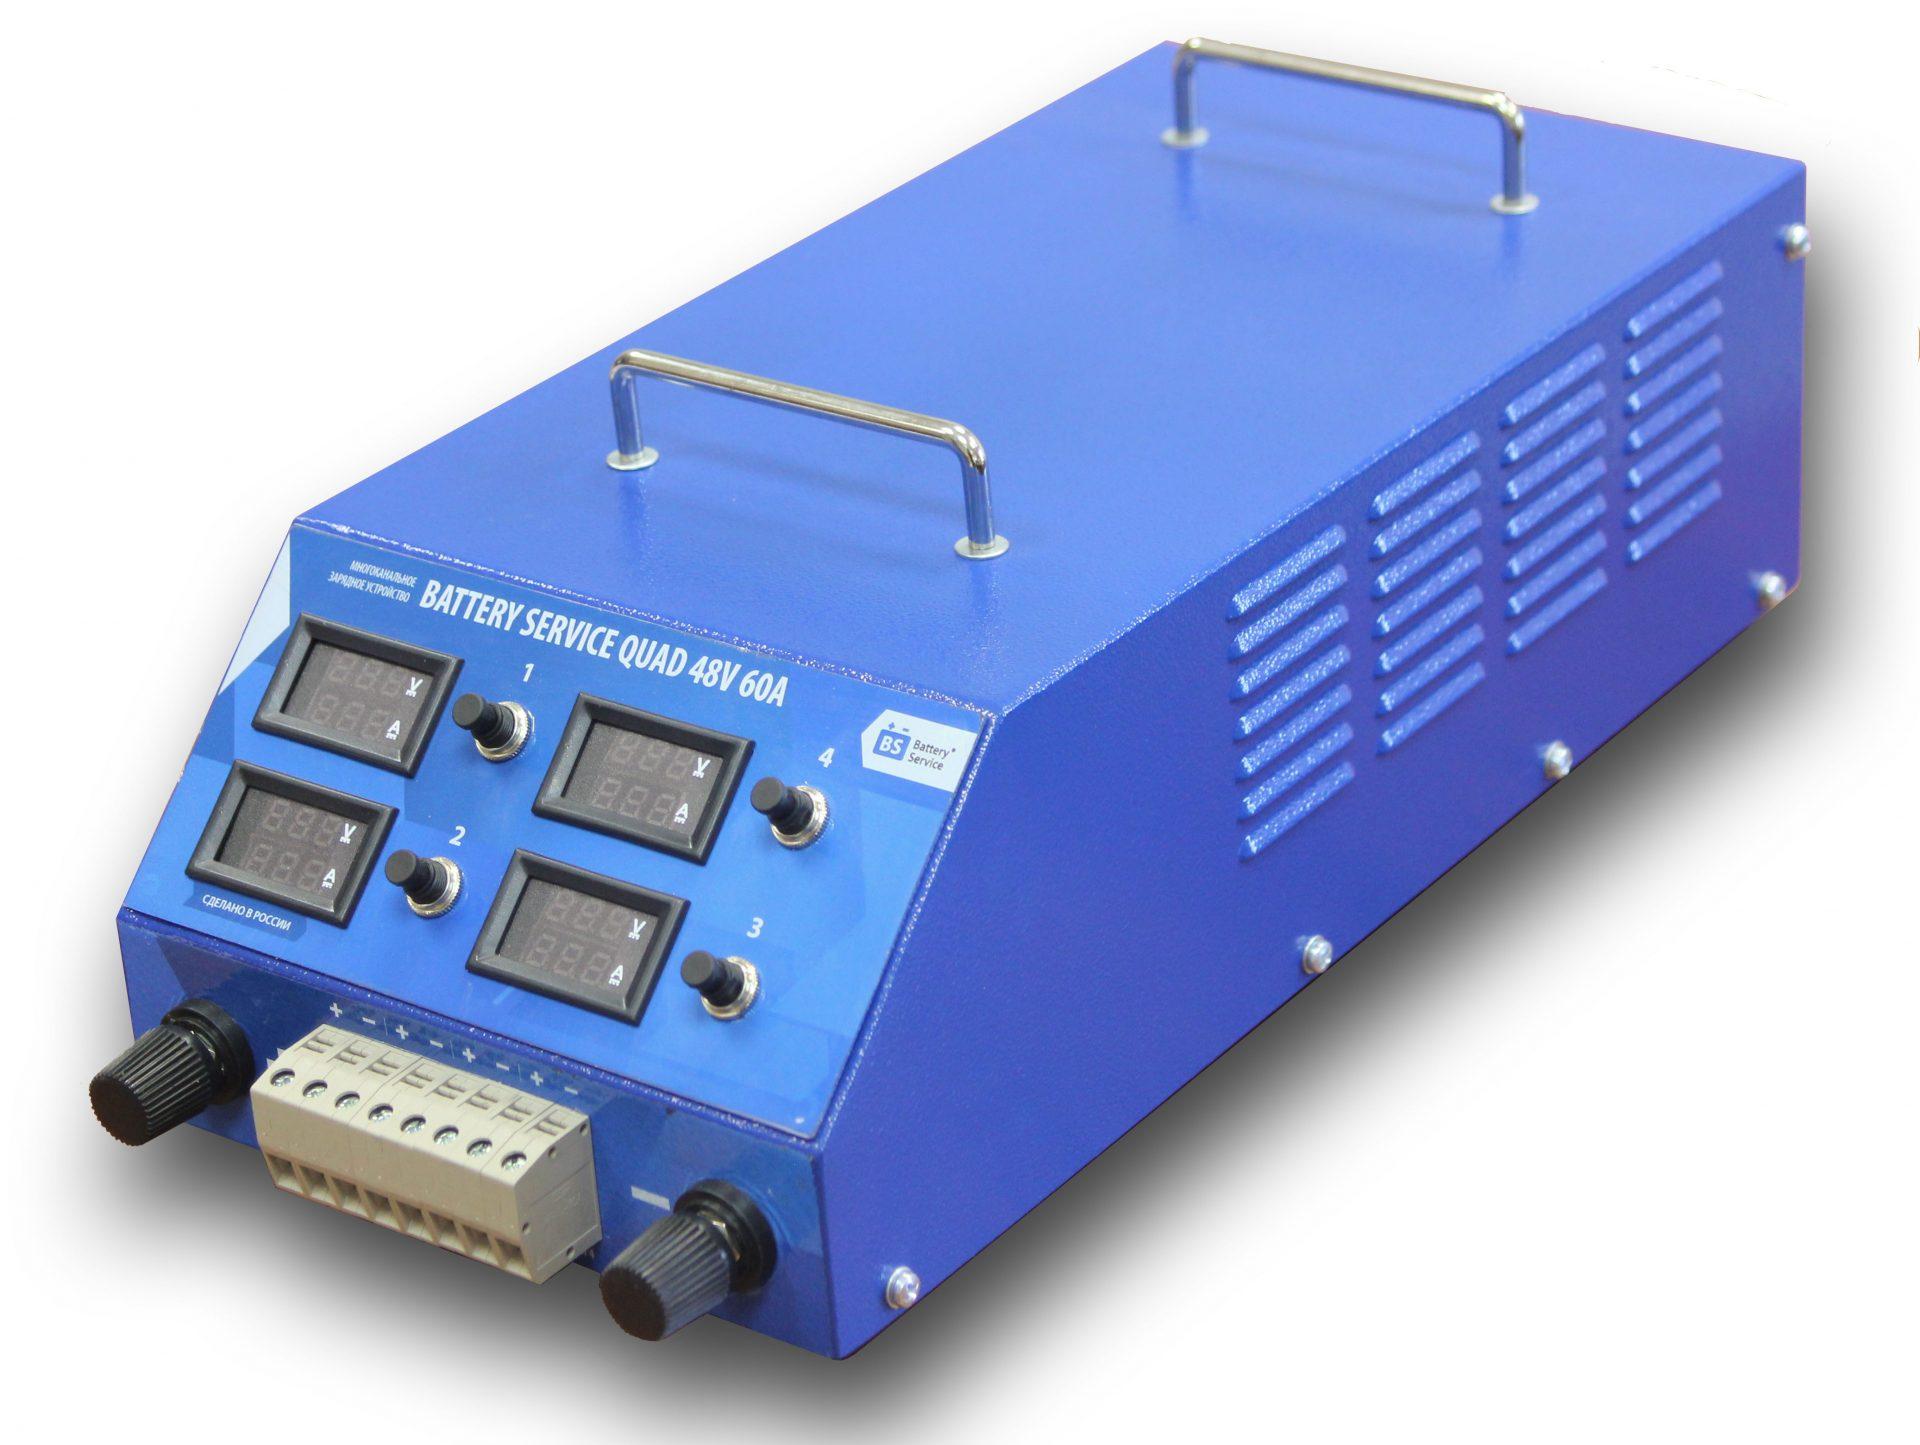 Зарядное устройство Battery Service QUAD 48V 60A, BS-C-4×48/60